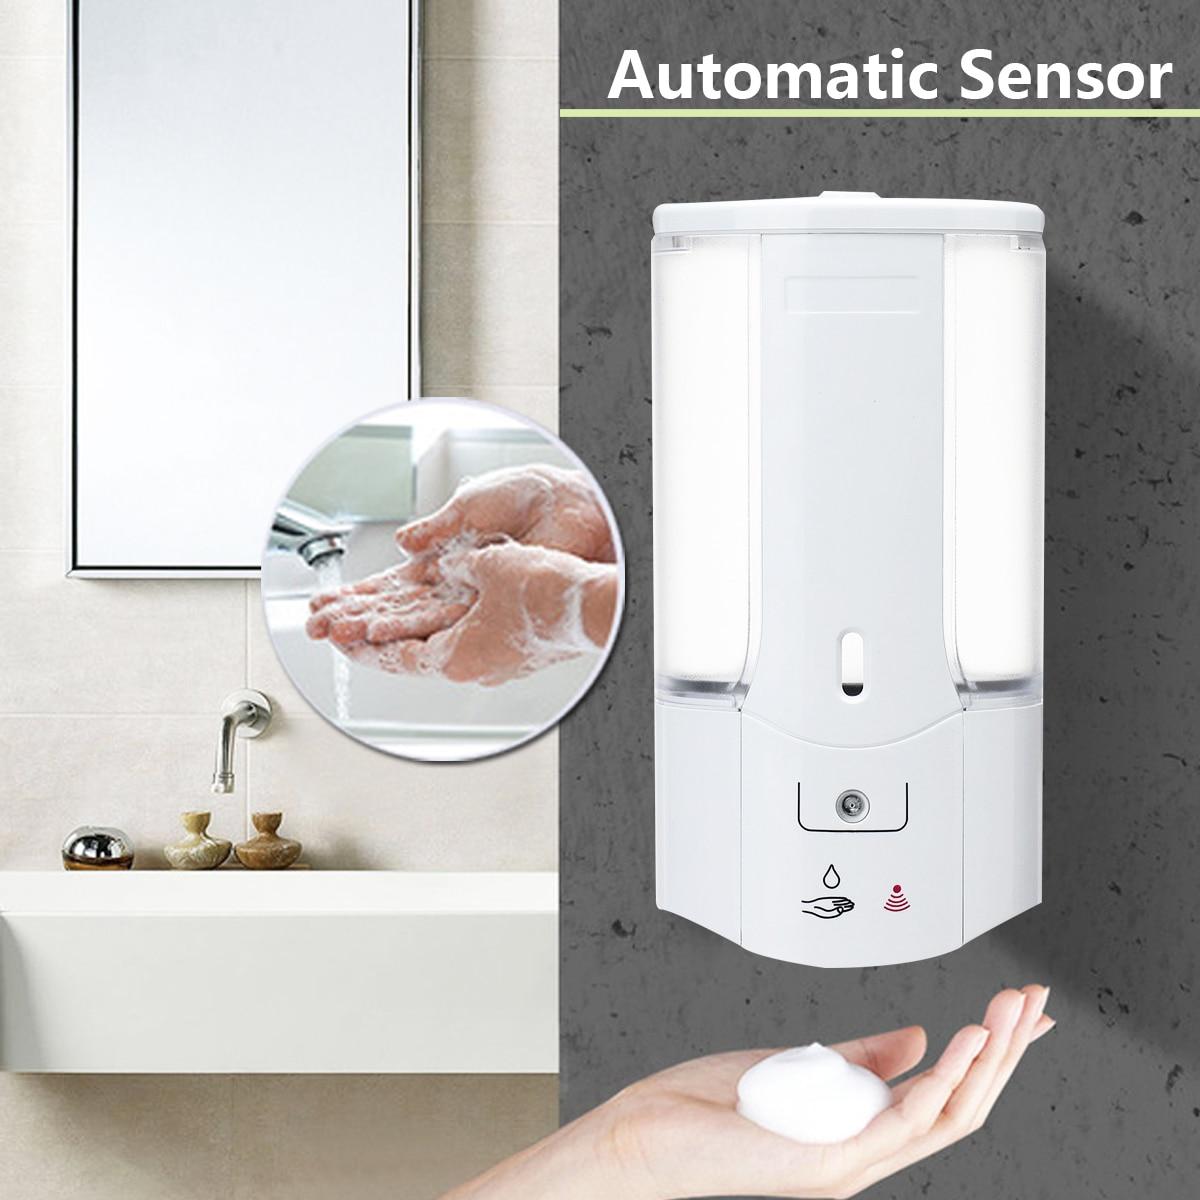 500mL Liquid Soap Dispensers Automatic Sensor Hand-Free Soap Dispenser Shampoo Bathroom Wall Mounted Dispenser With Cover